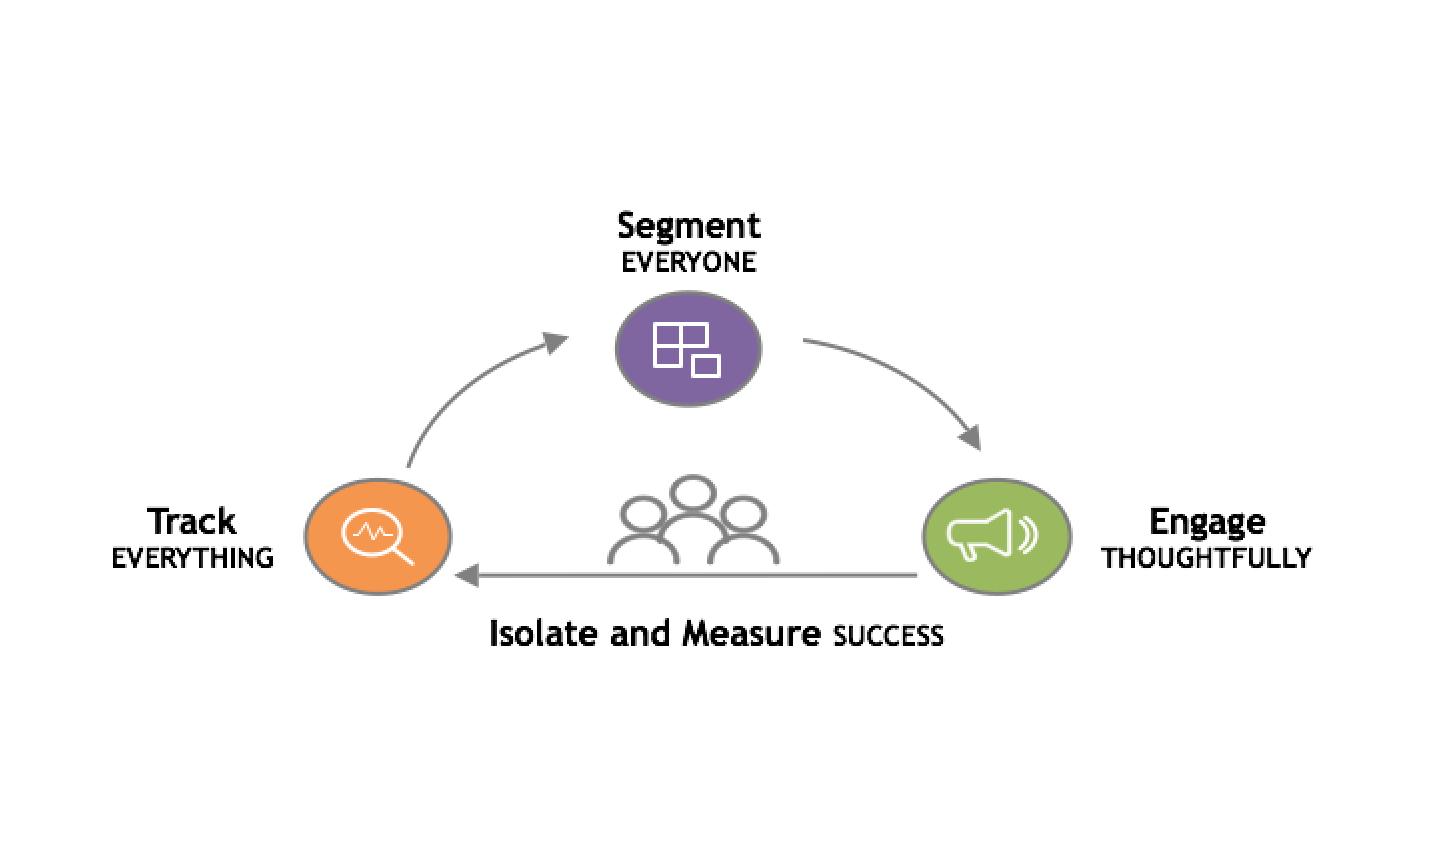 Isolate & Measure Success